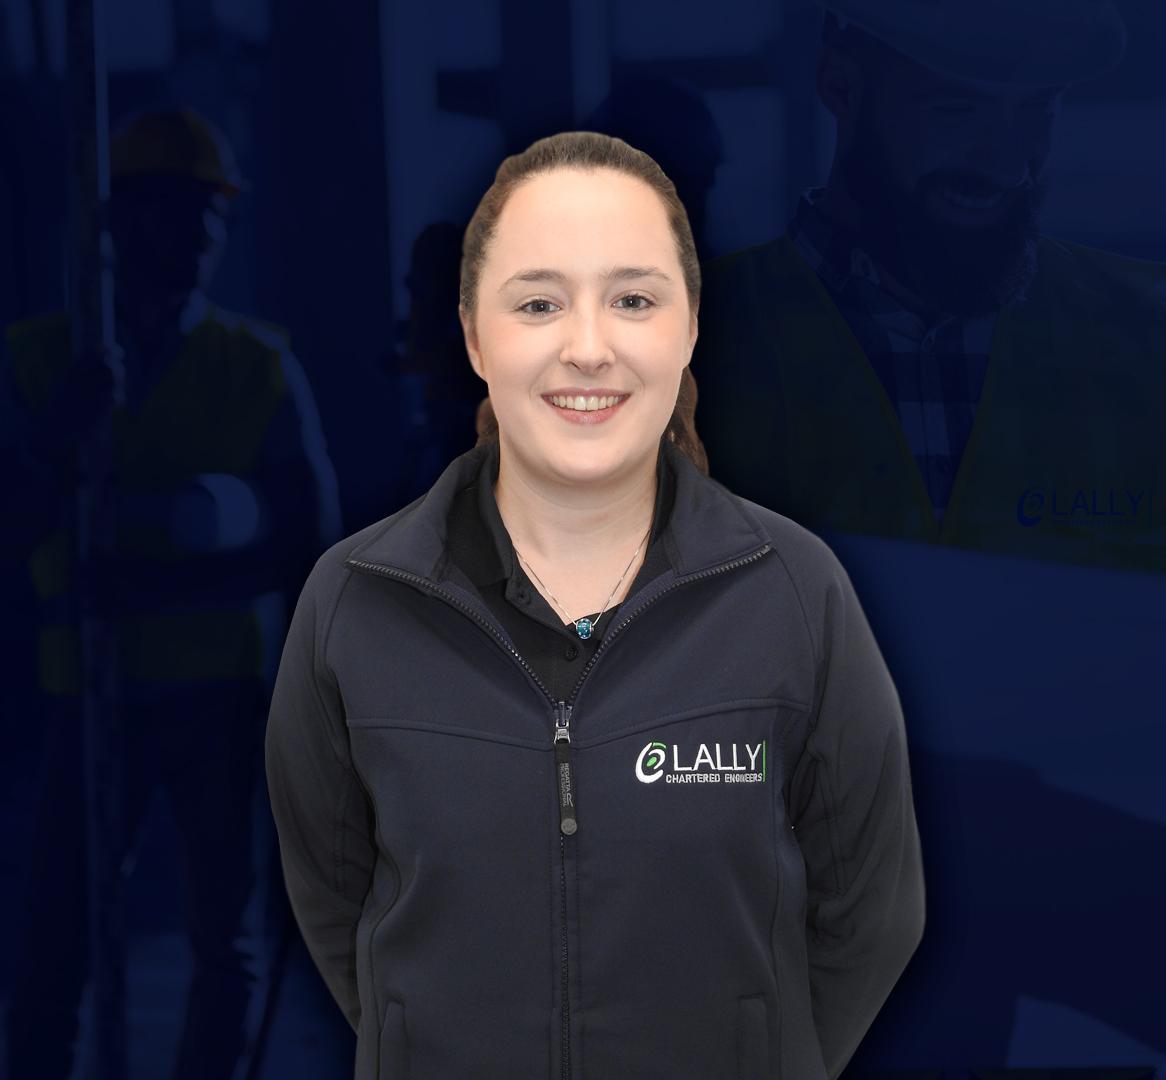 Graduate Design Engineer, Lally Chartered Engineers, Mayo, Ireland